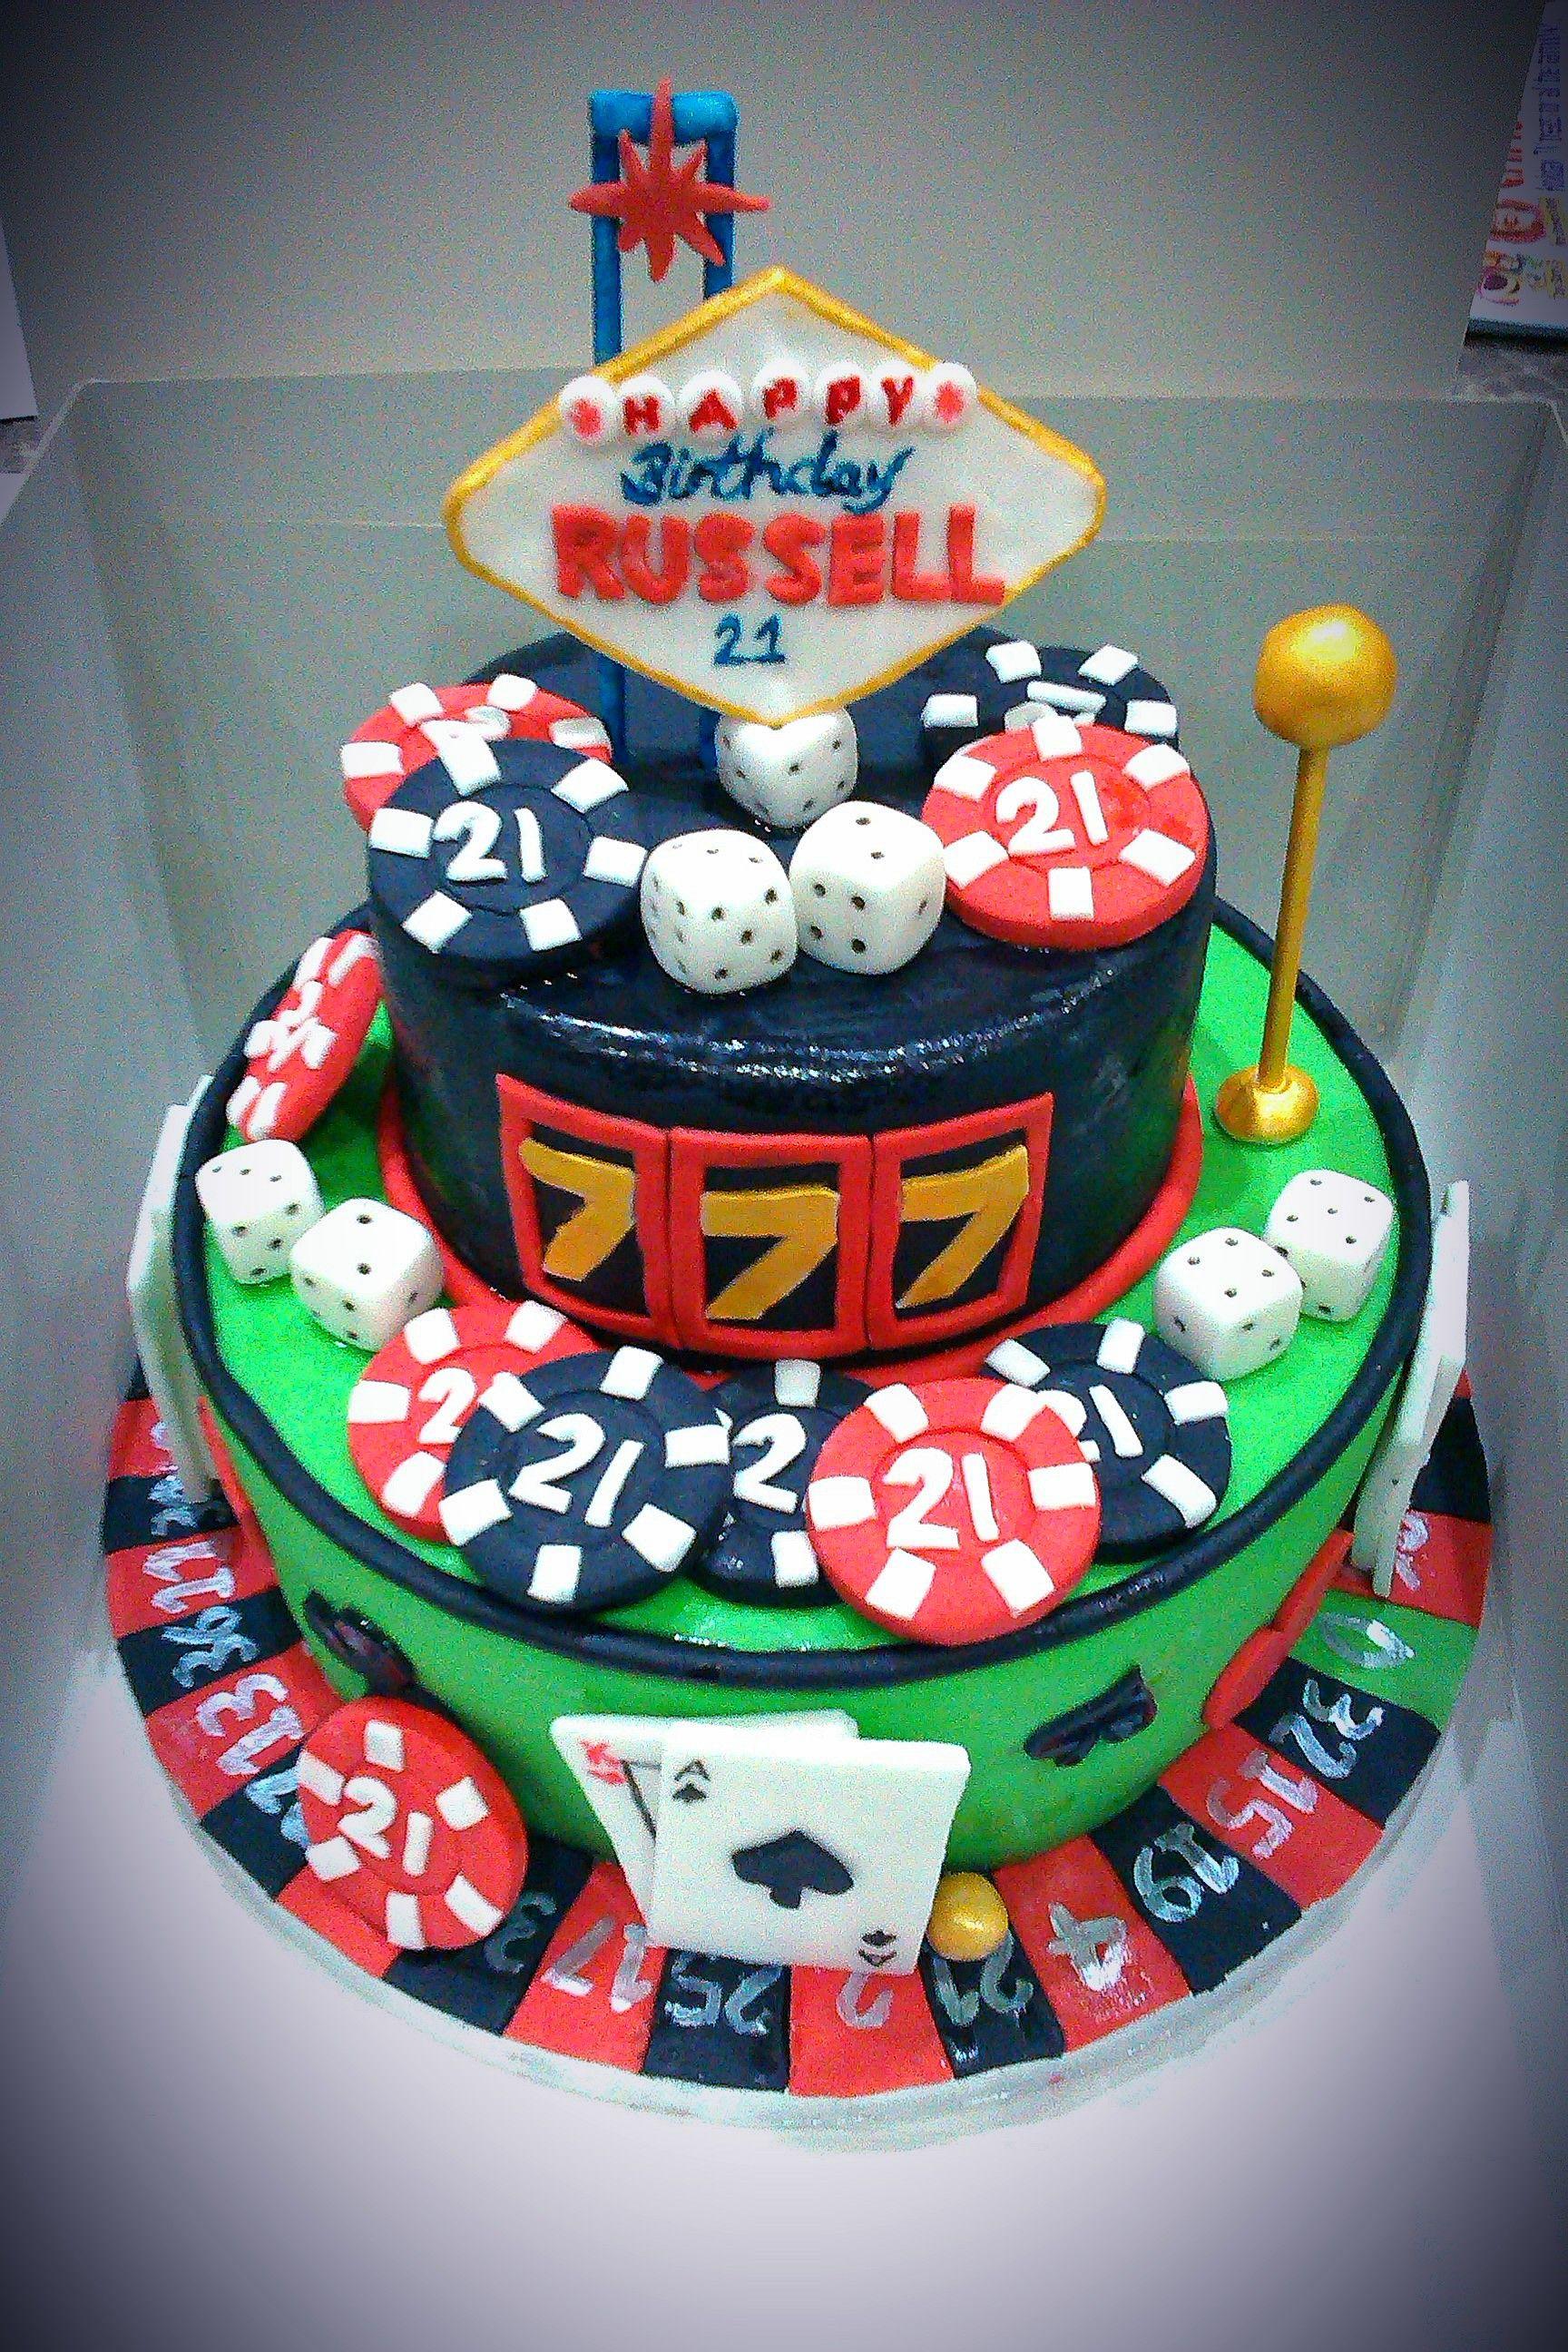 Incredible Birthday Cakes 21St Casino Cake Casino Cakes How To Make Cake Funny Birthday Cards Online Barepcheapnameinfo